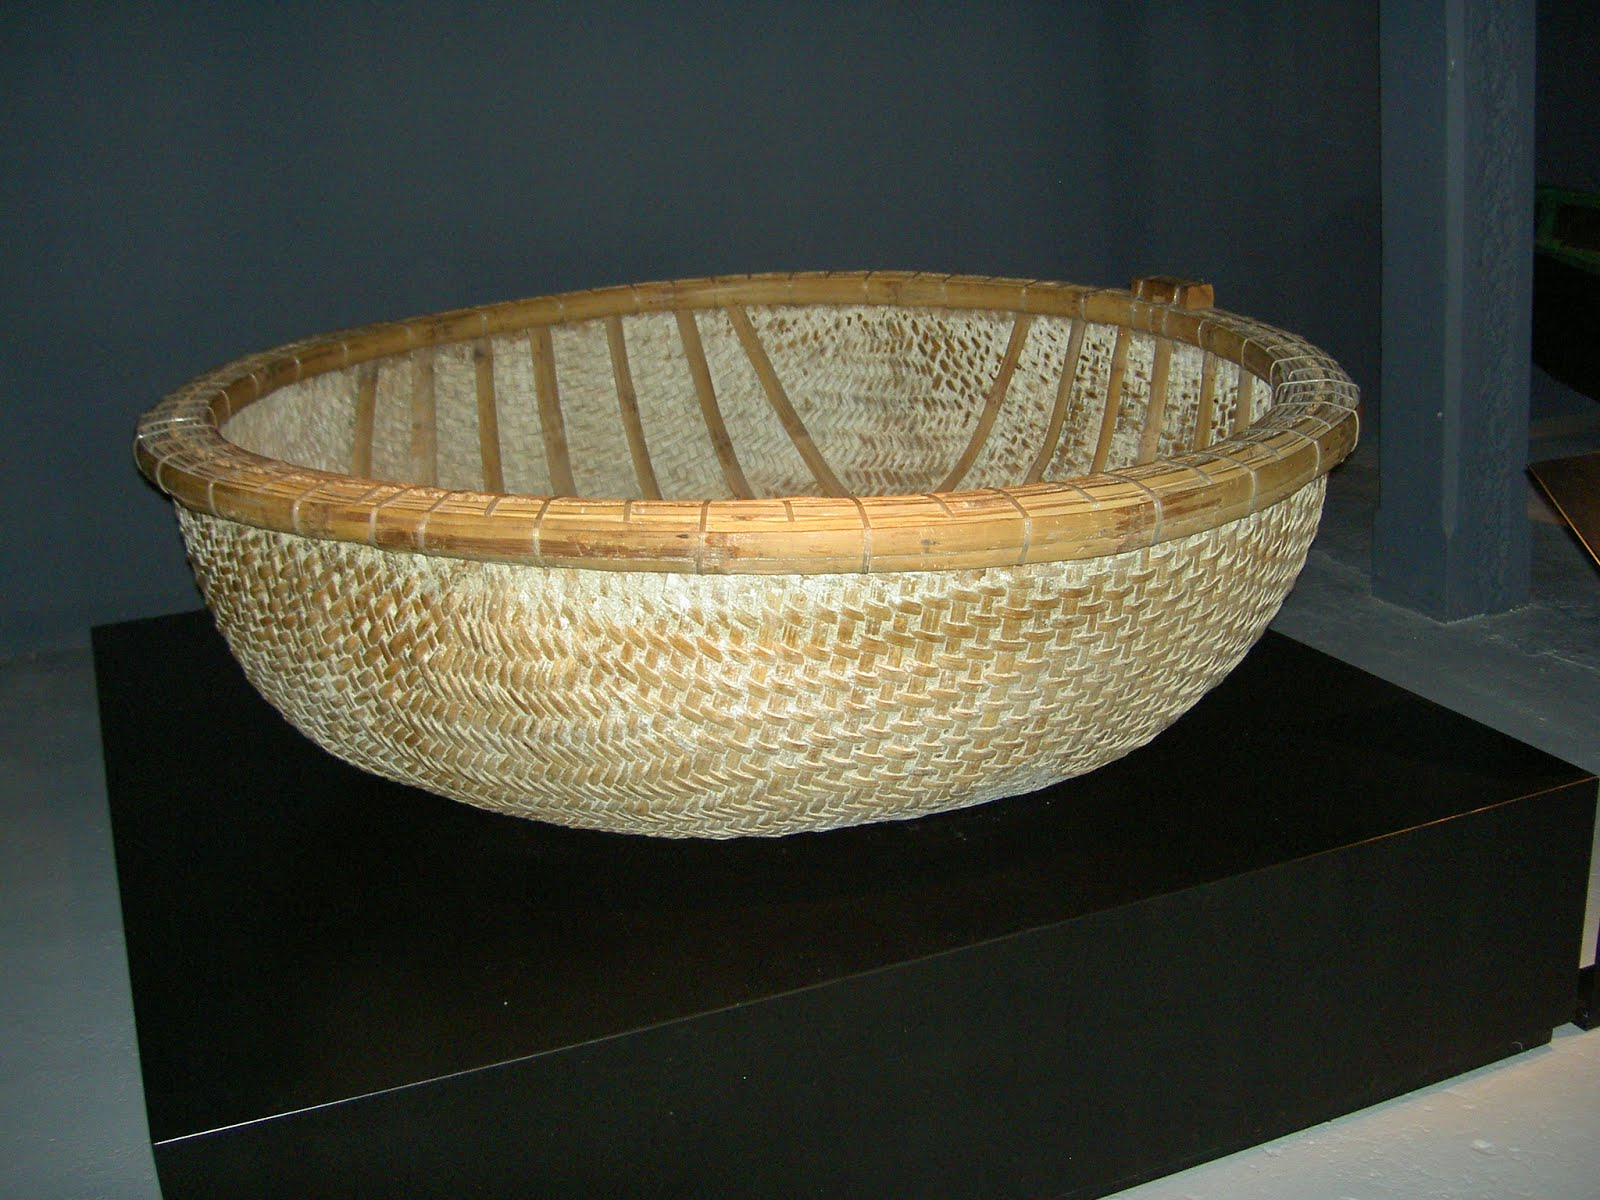 Basket_boat.JPG